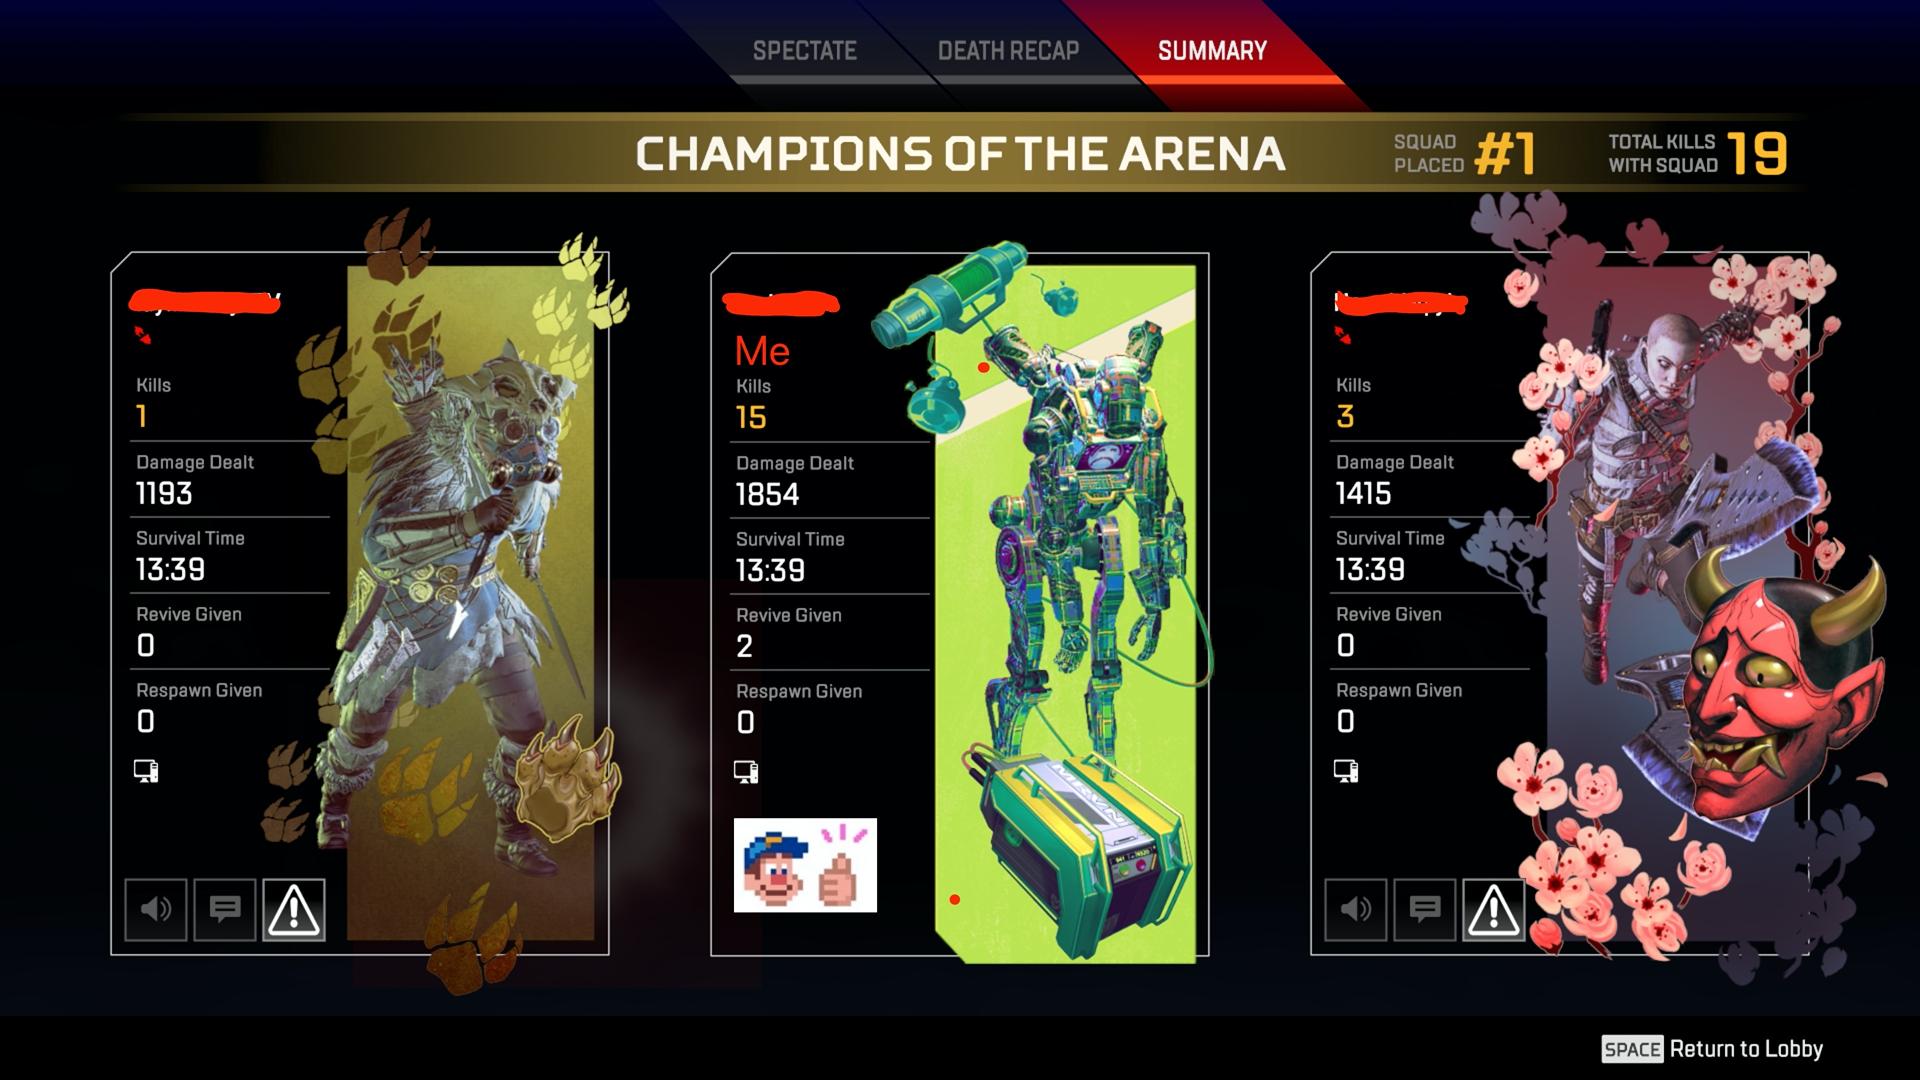 Pathfinder: We are the champion squad!